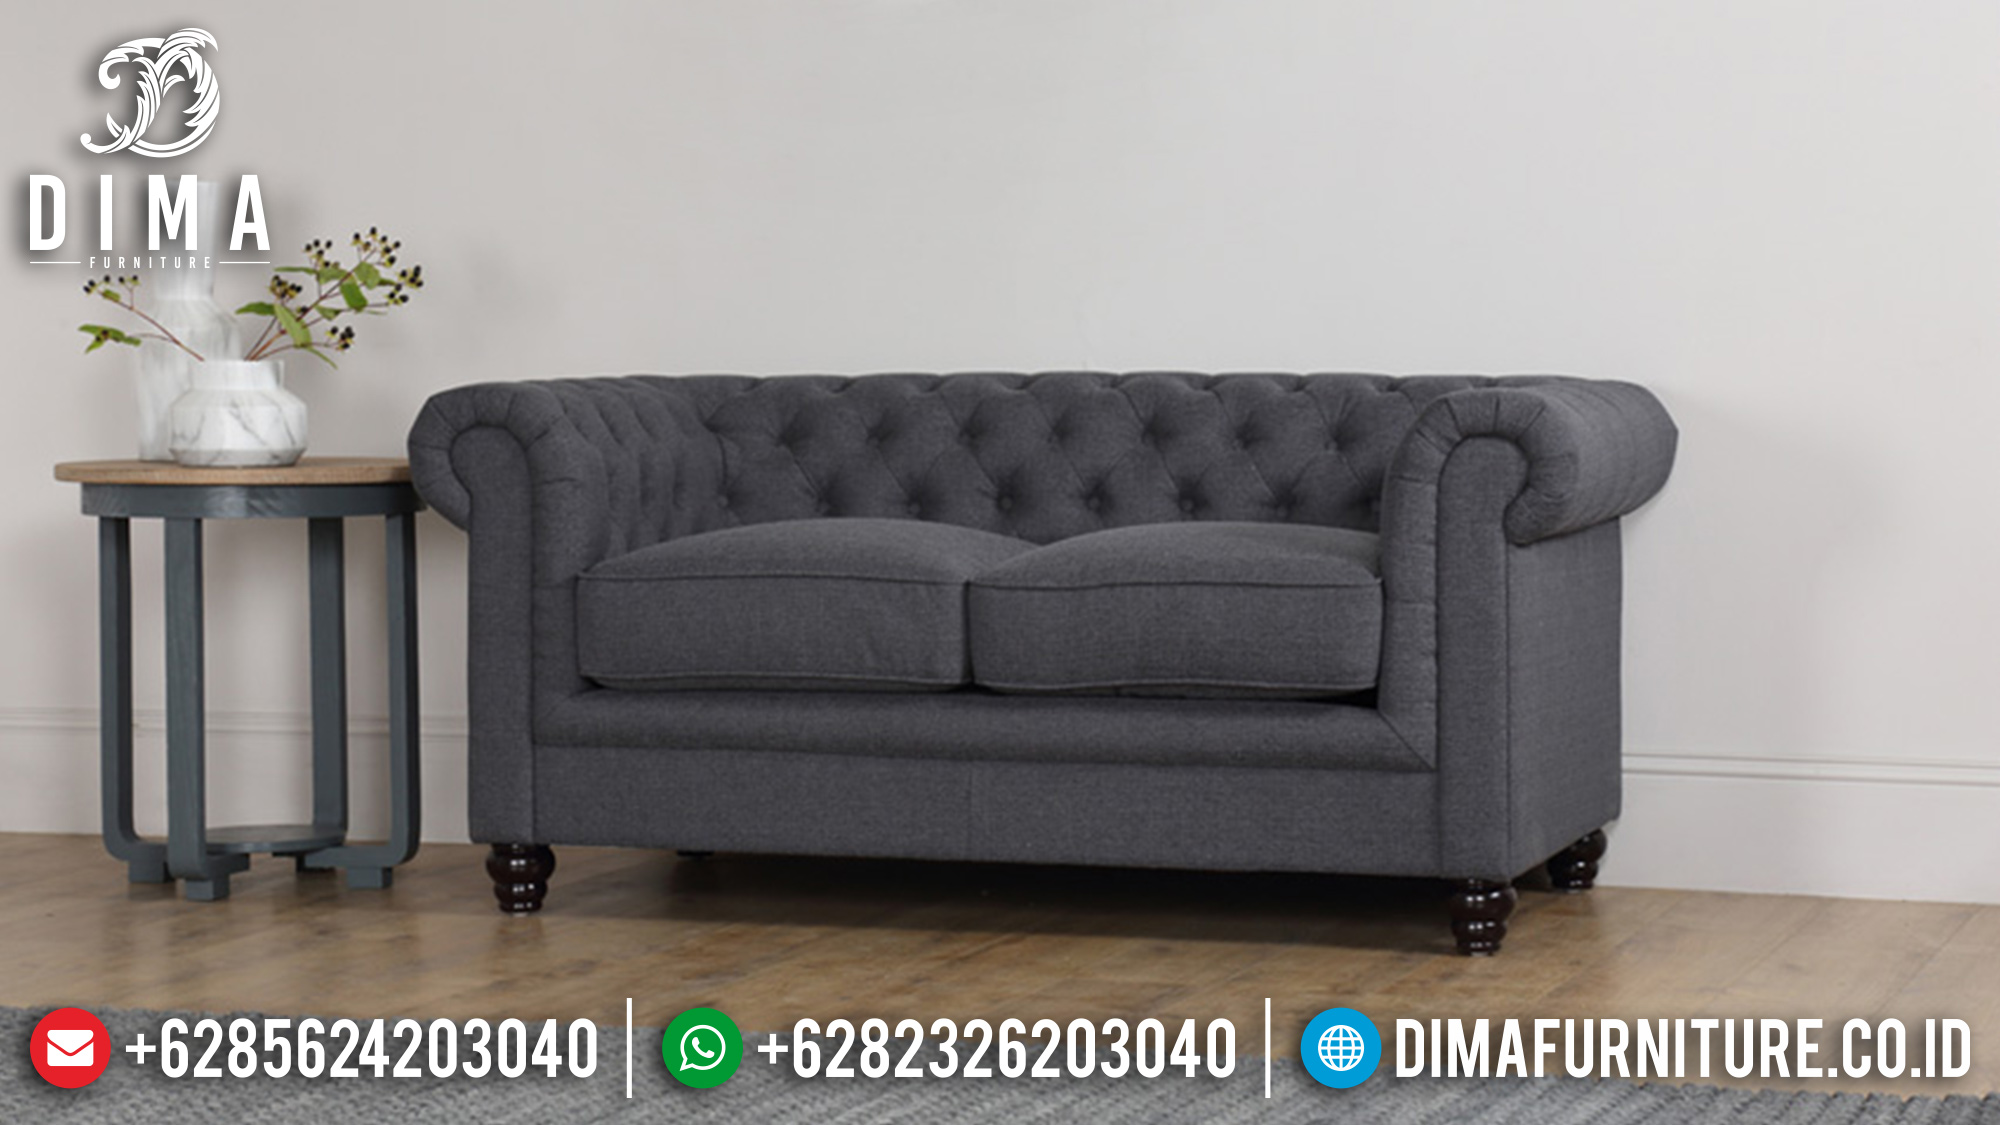 Set Sofa Tamu Minimalis Mewah Jepara Fabric Canvas Terbaru 2018 ST-0525 Gambar 2